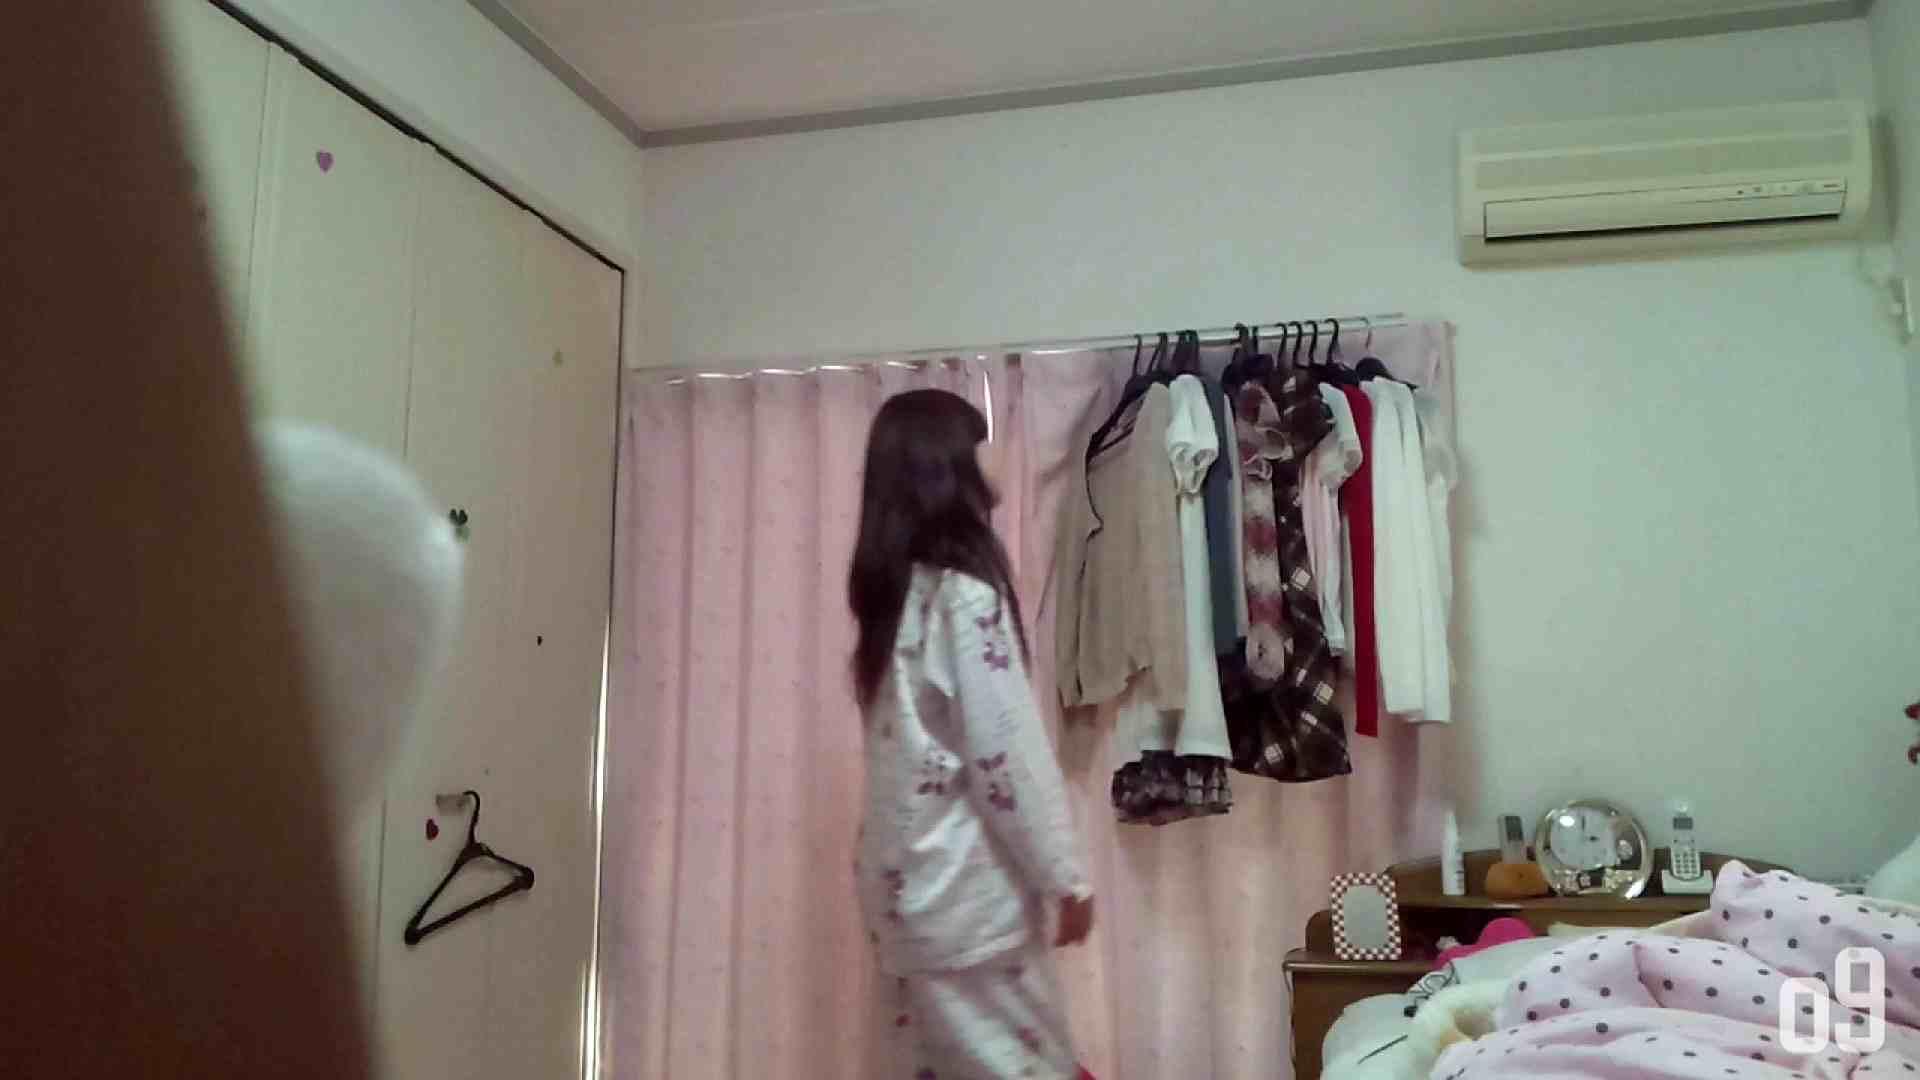 vol.2 瑞希ちゃんの自宅公開!寝起きの着替え・・・ラリルそー 着替え | エッチなOL  77pic 16